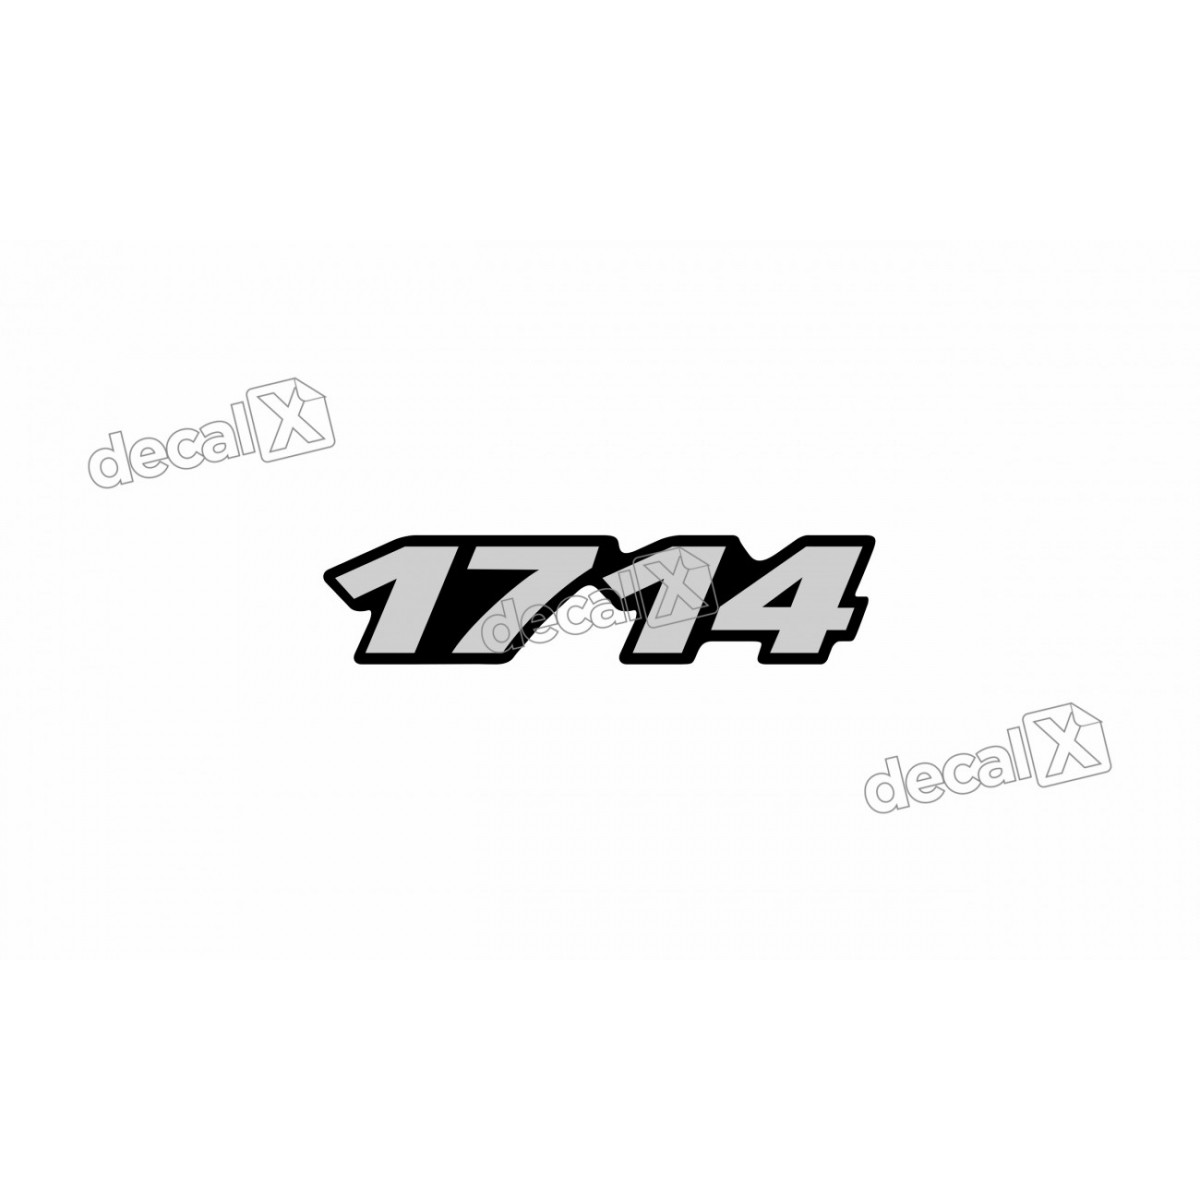 Adesivo Emblema Resinado Mercedes 1714 Cm57 Decalx